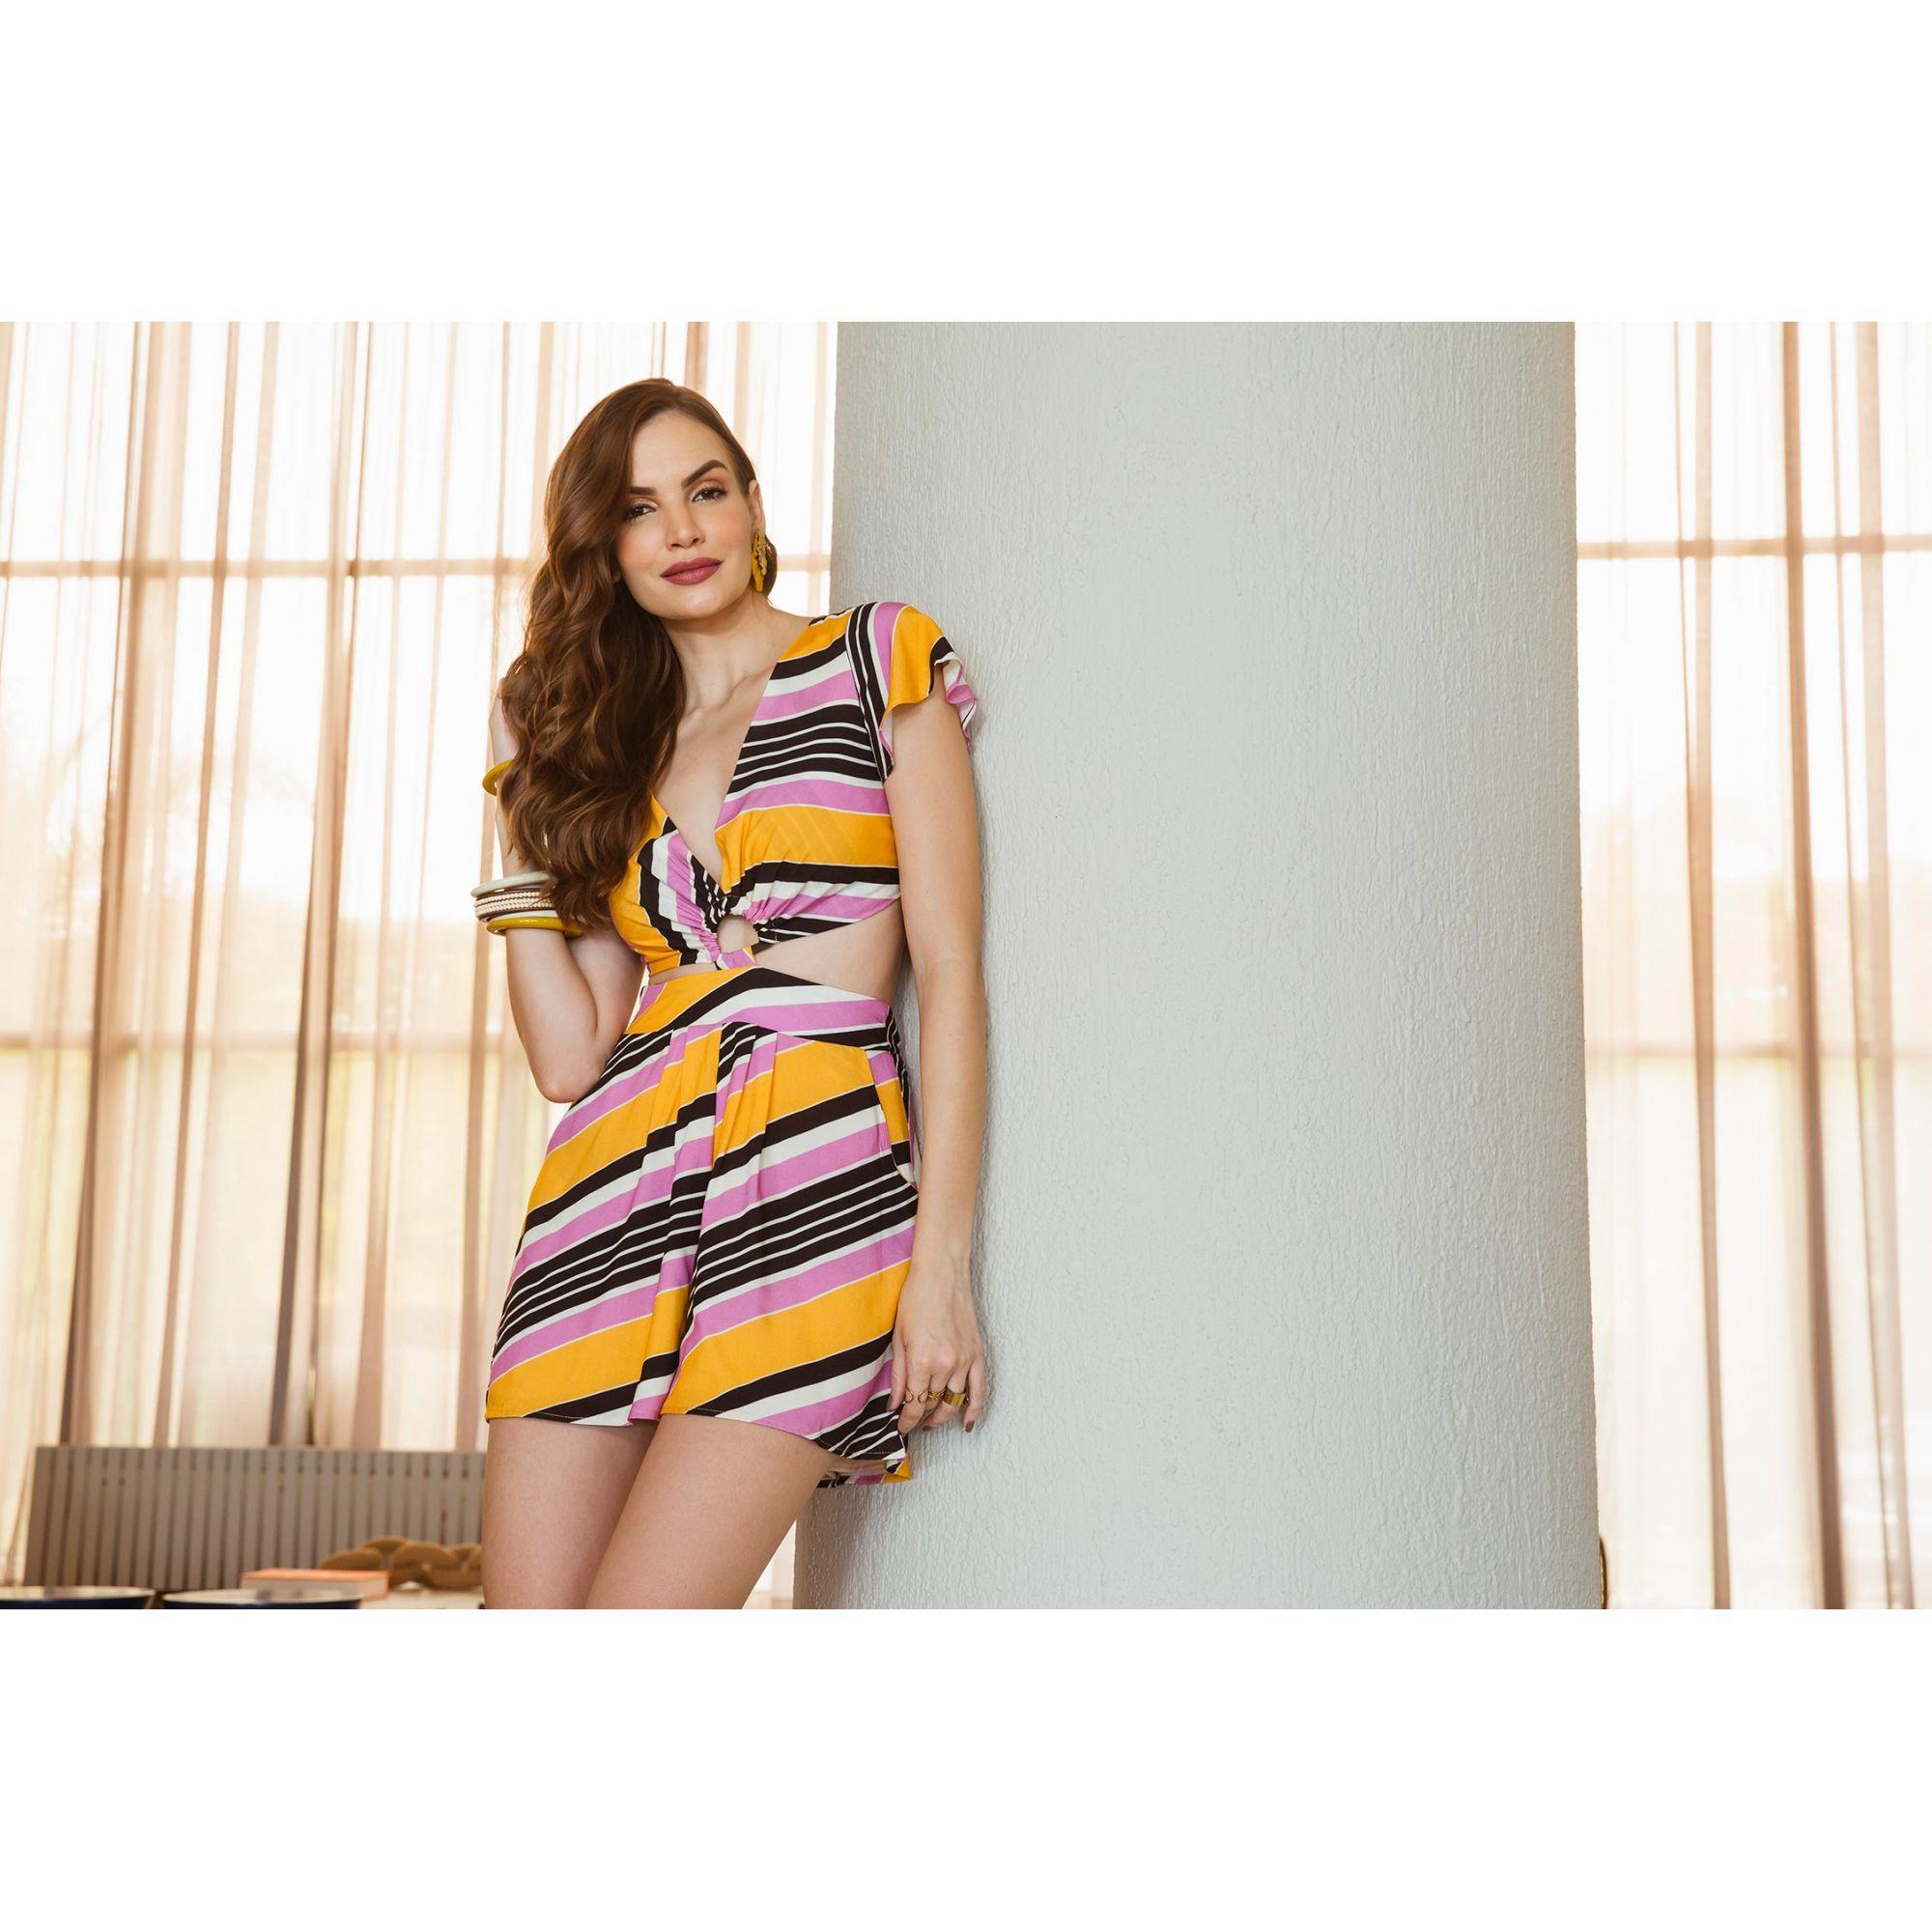 aa27e8ac43 Macacão Curto Estampado - VANKOKE - Moda Feminina - Vestidos